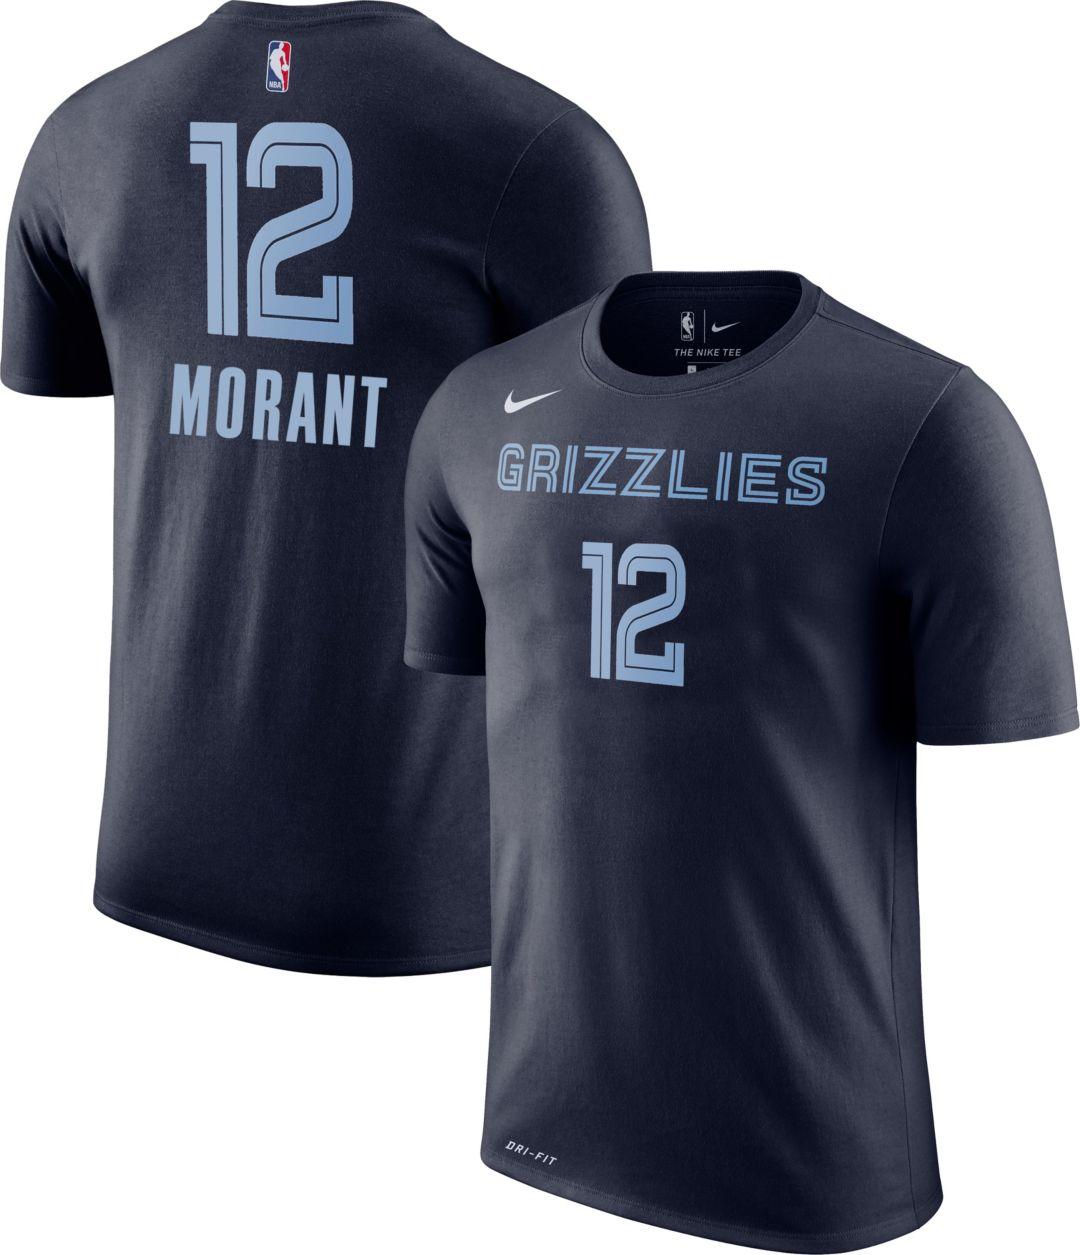 best website c529a 573b0 Nike Youth Memphis Grizzlies Ja Morant #12 Dri-FIT Navy T-Shirt